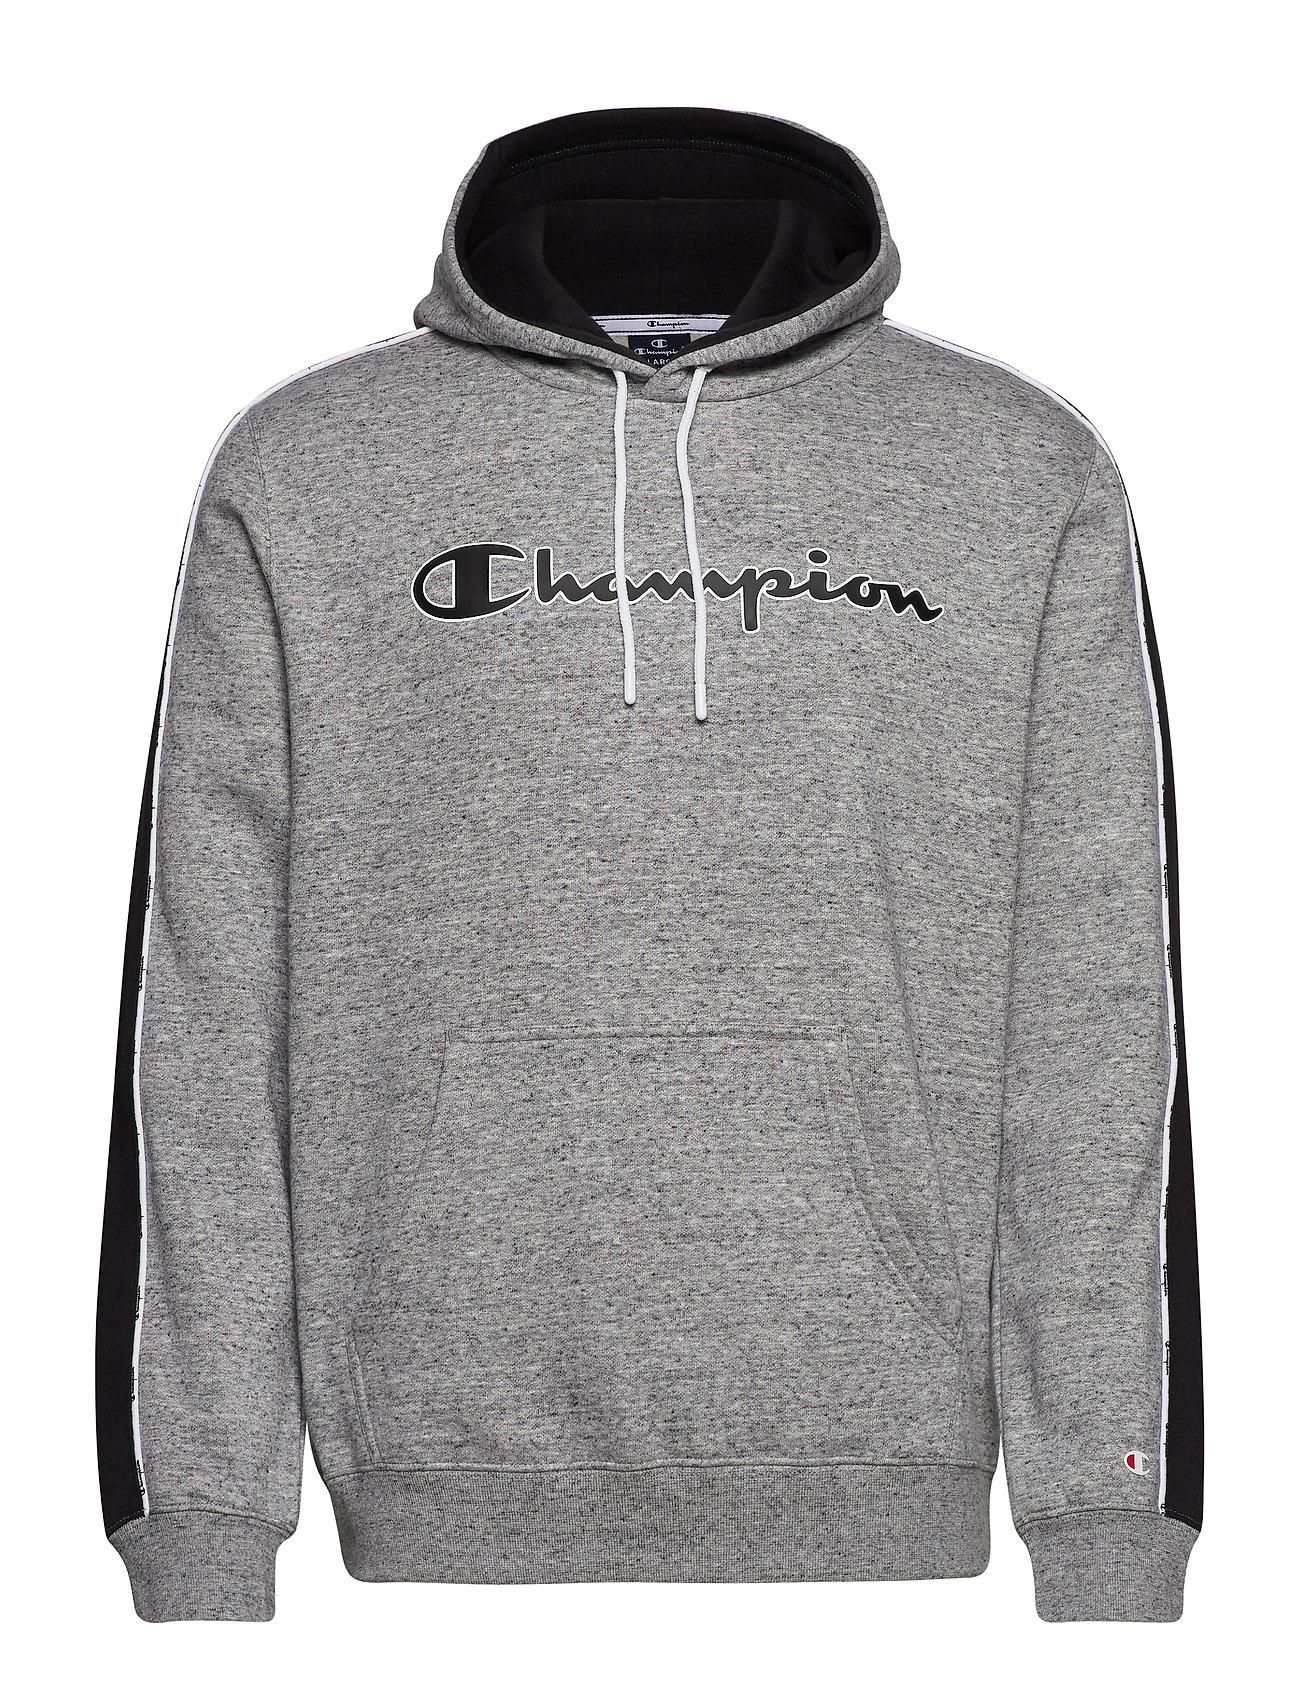 Champion Hooded Sweatshirt - GREY MELANGE  LIGHT